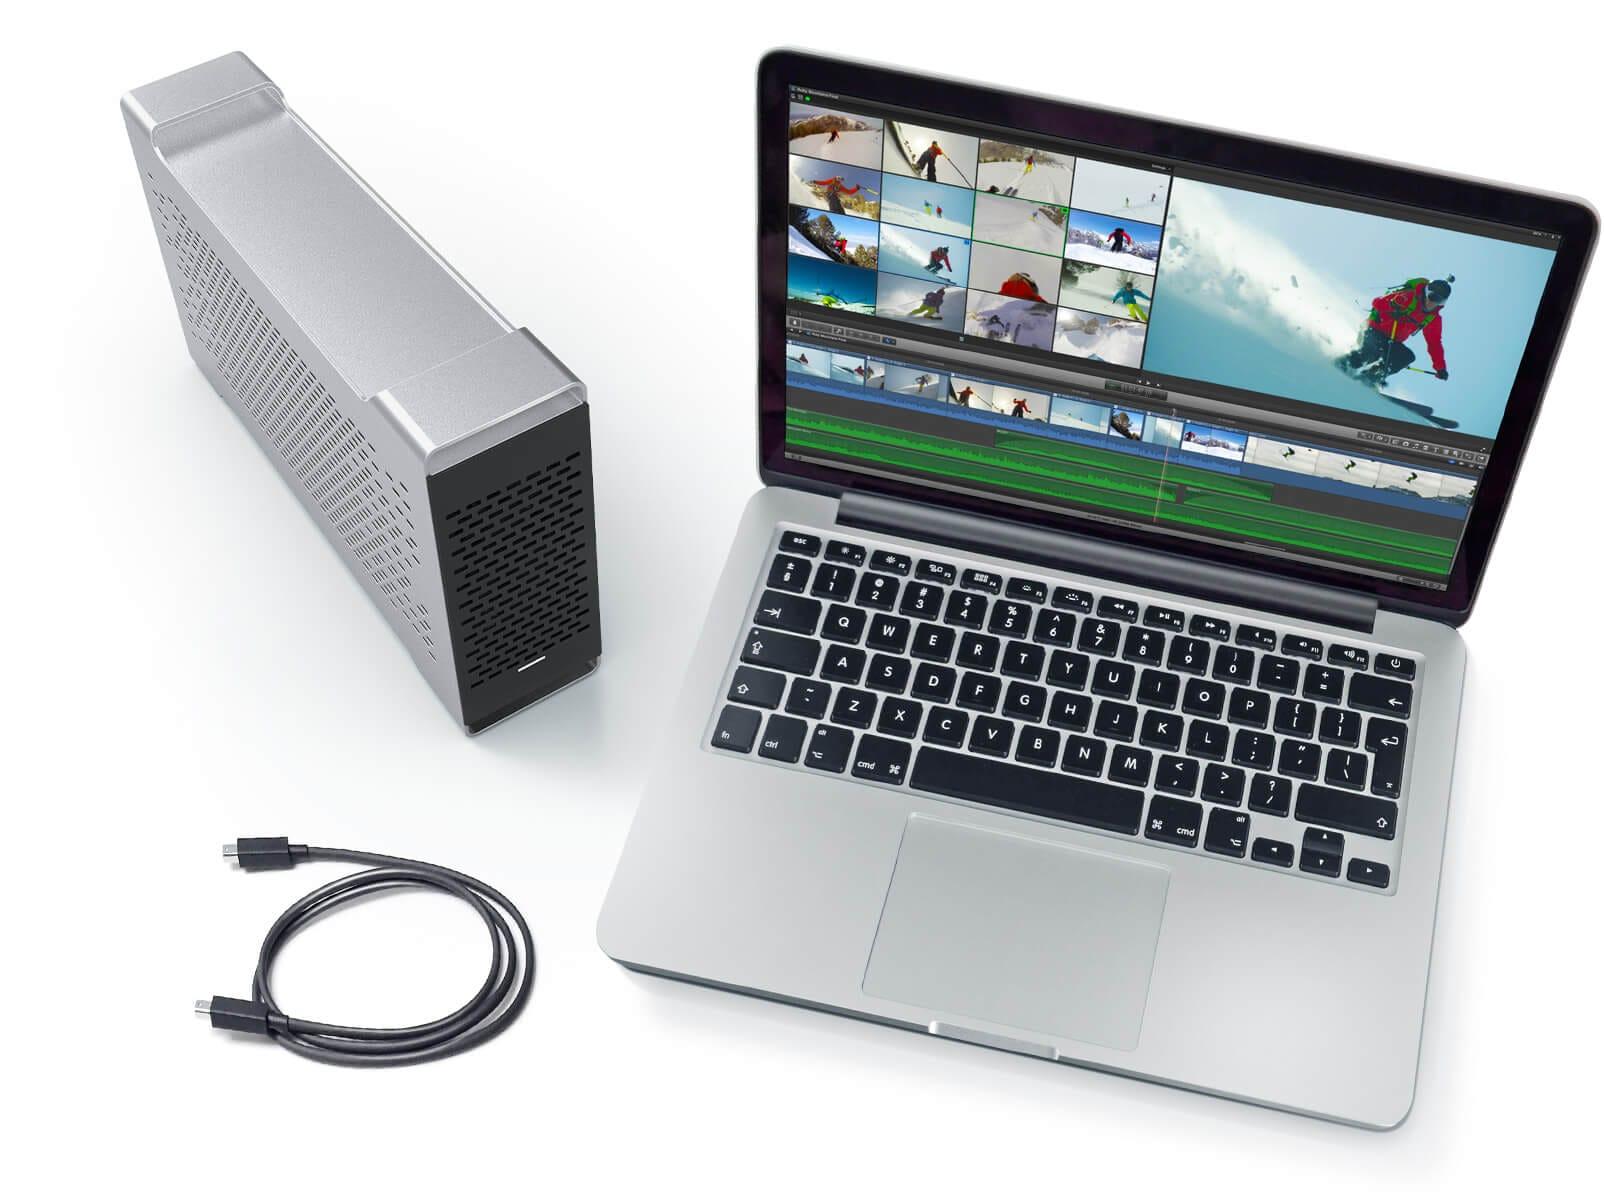 bizon united states external graphics card egpu for apple macbook mac pro mac mini imac. Black Bedroom Furniture Sets. Home Design Ideas